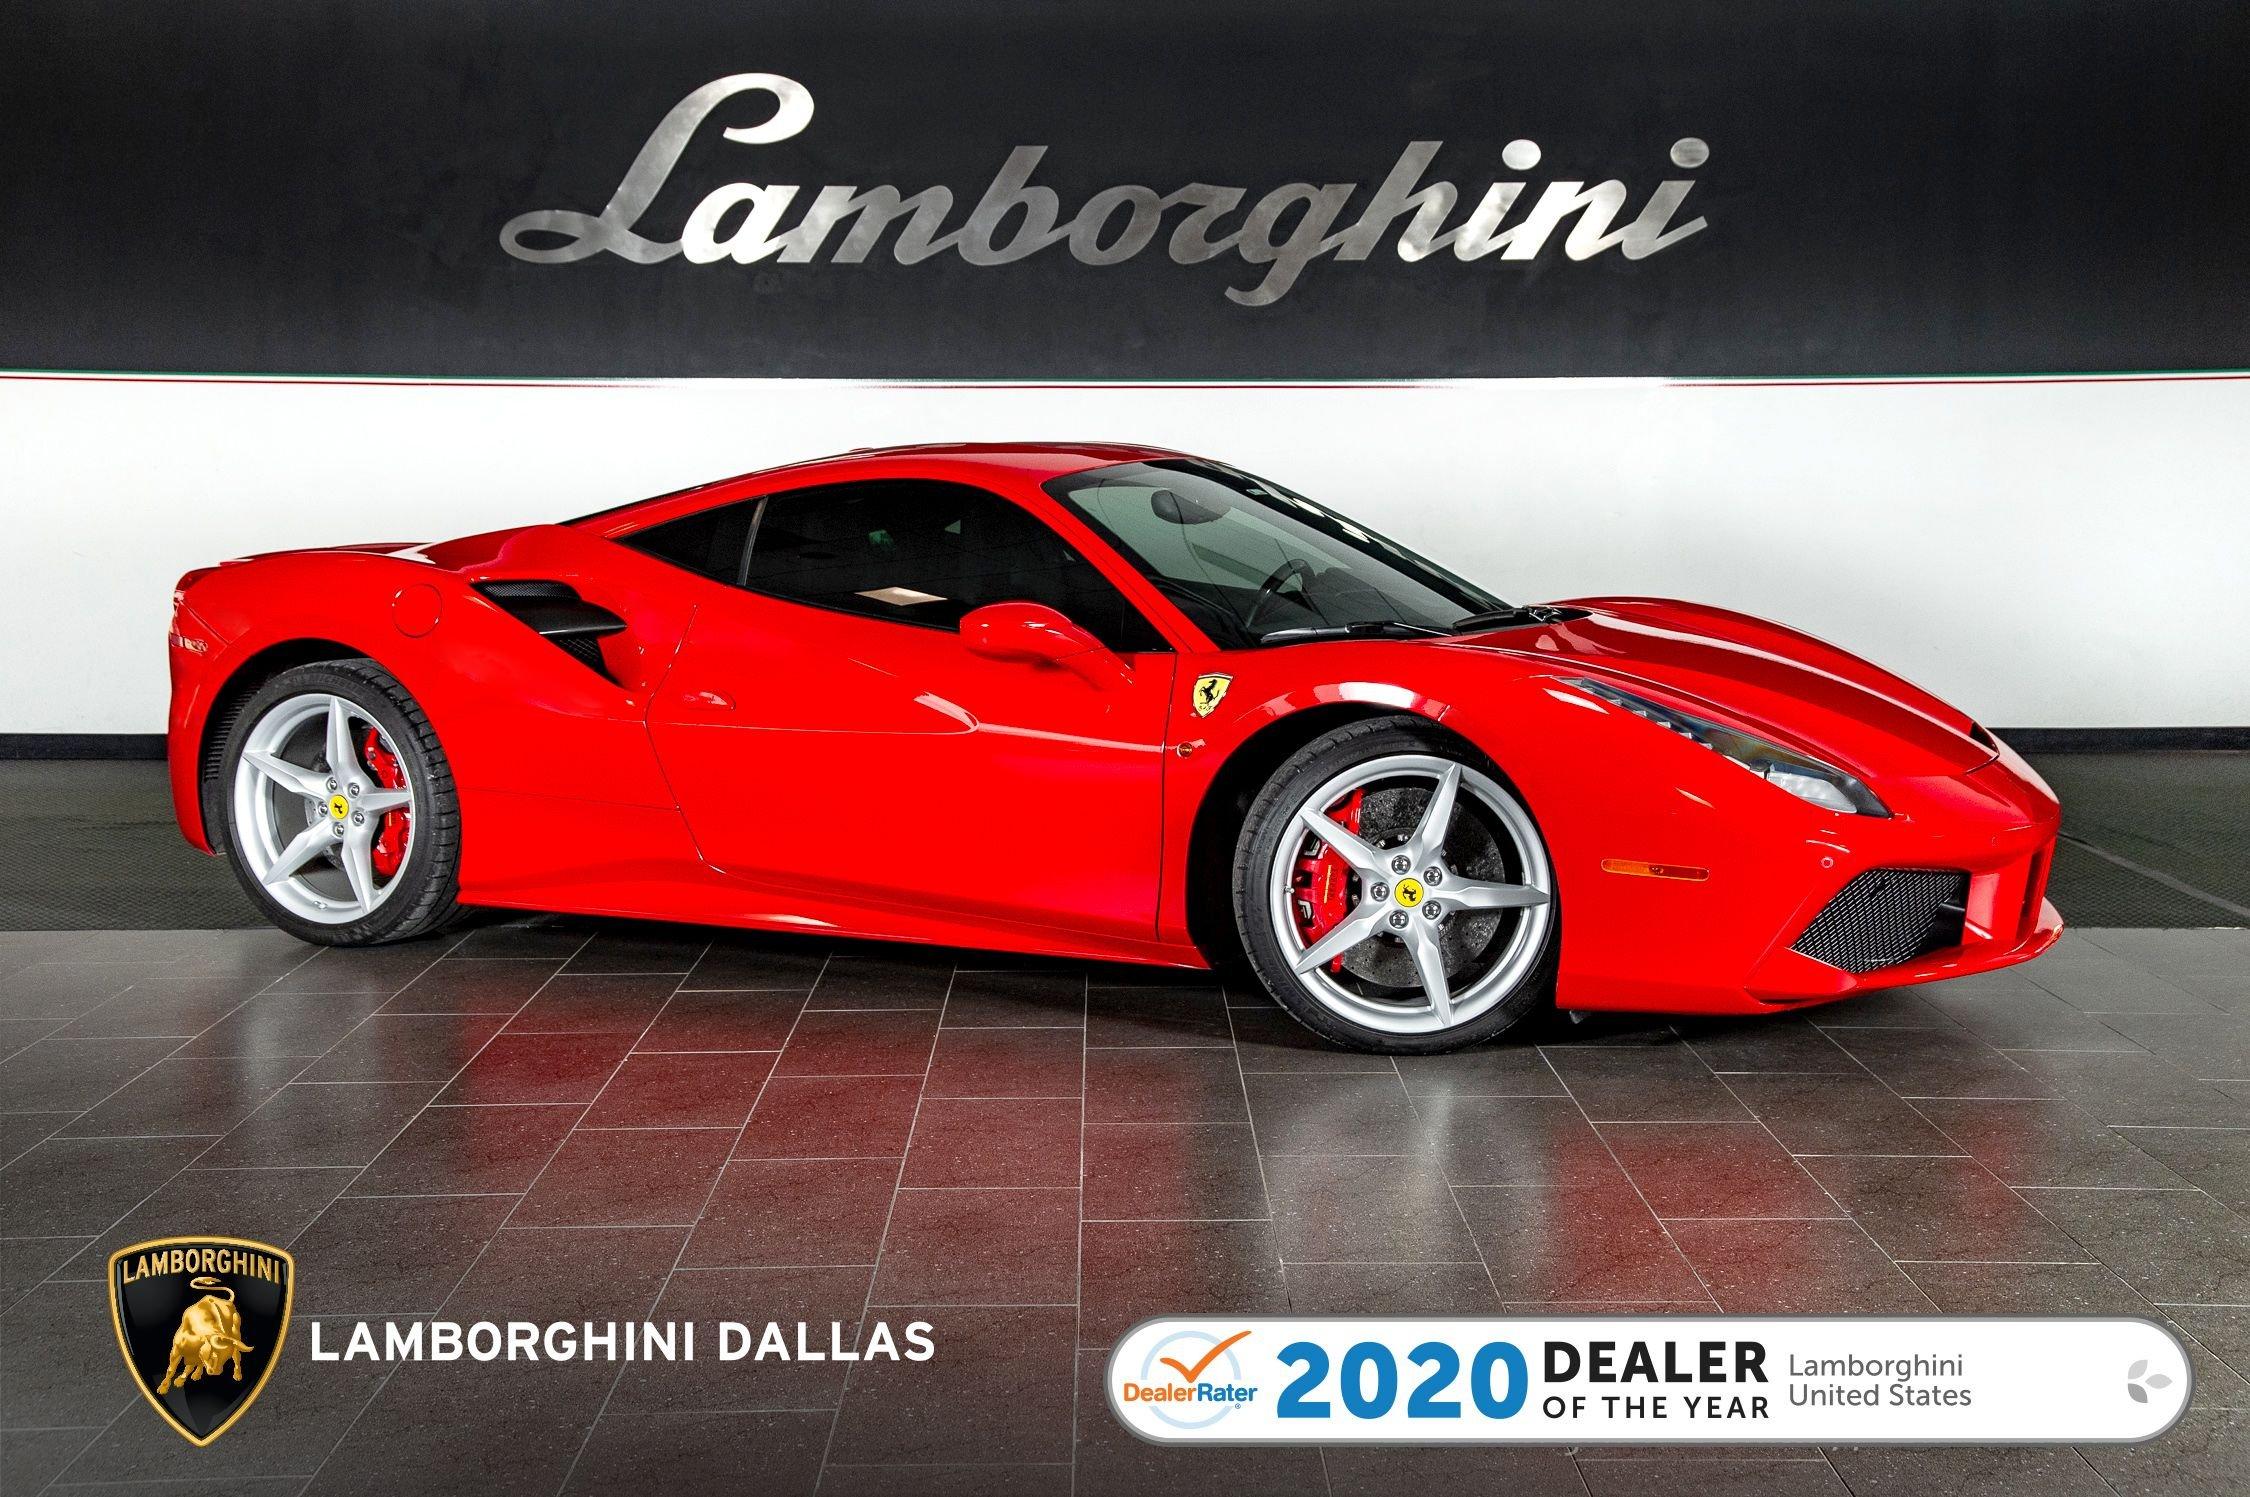 Used 2017 Ferrari 488 Gtb For Sale Richardson Tx Stock 20l0237a Vin Zff79ala6h0220819